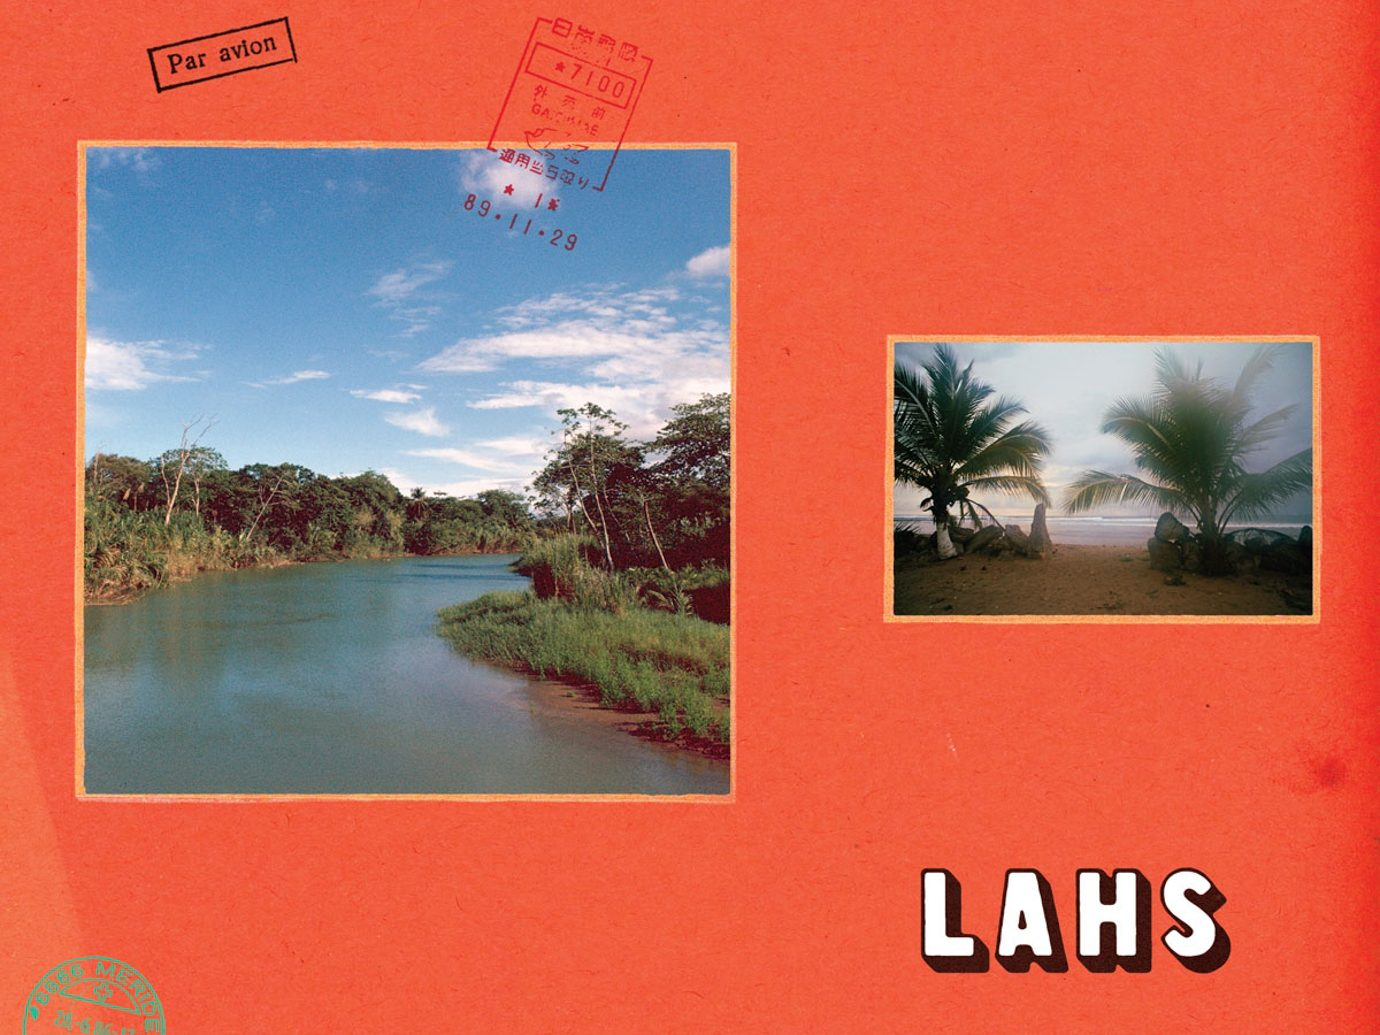 Album der Woche: Allah Las – LAHS